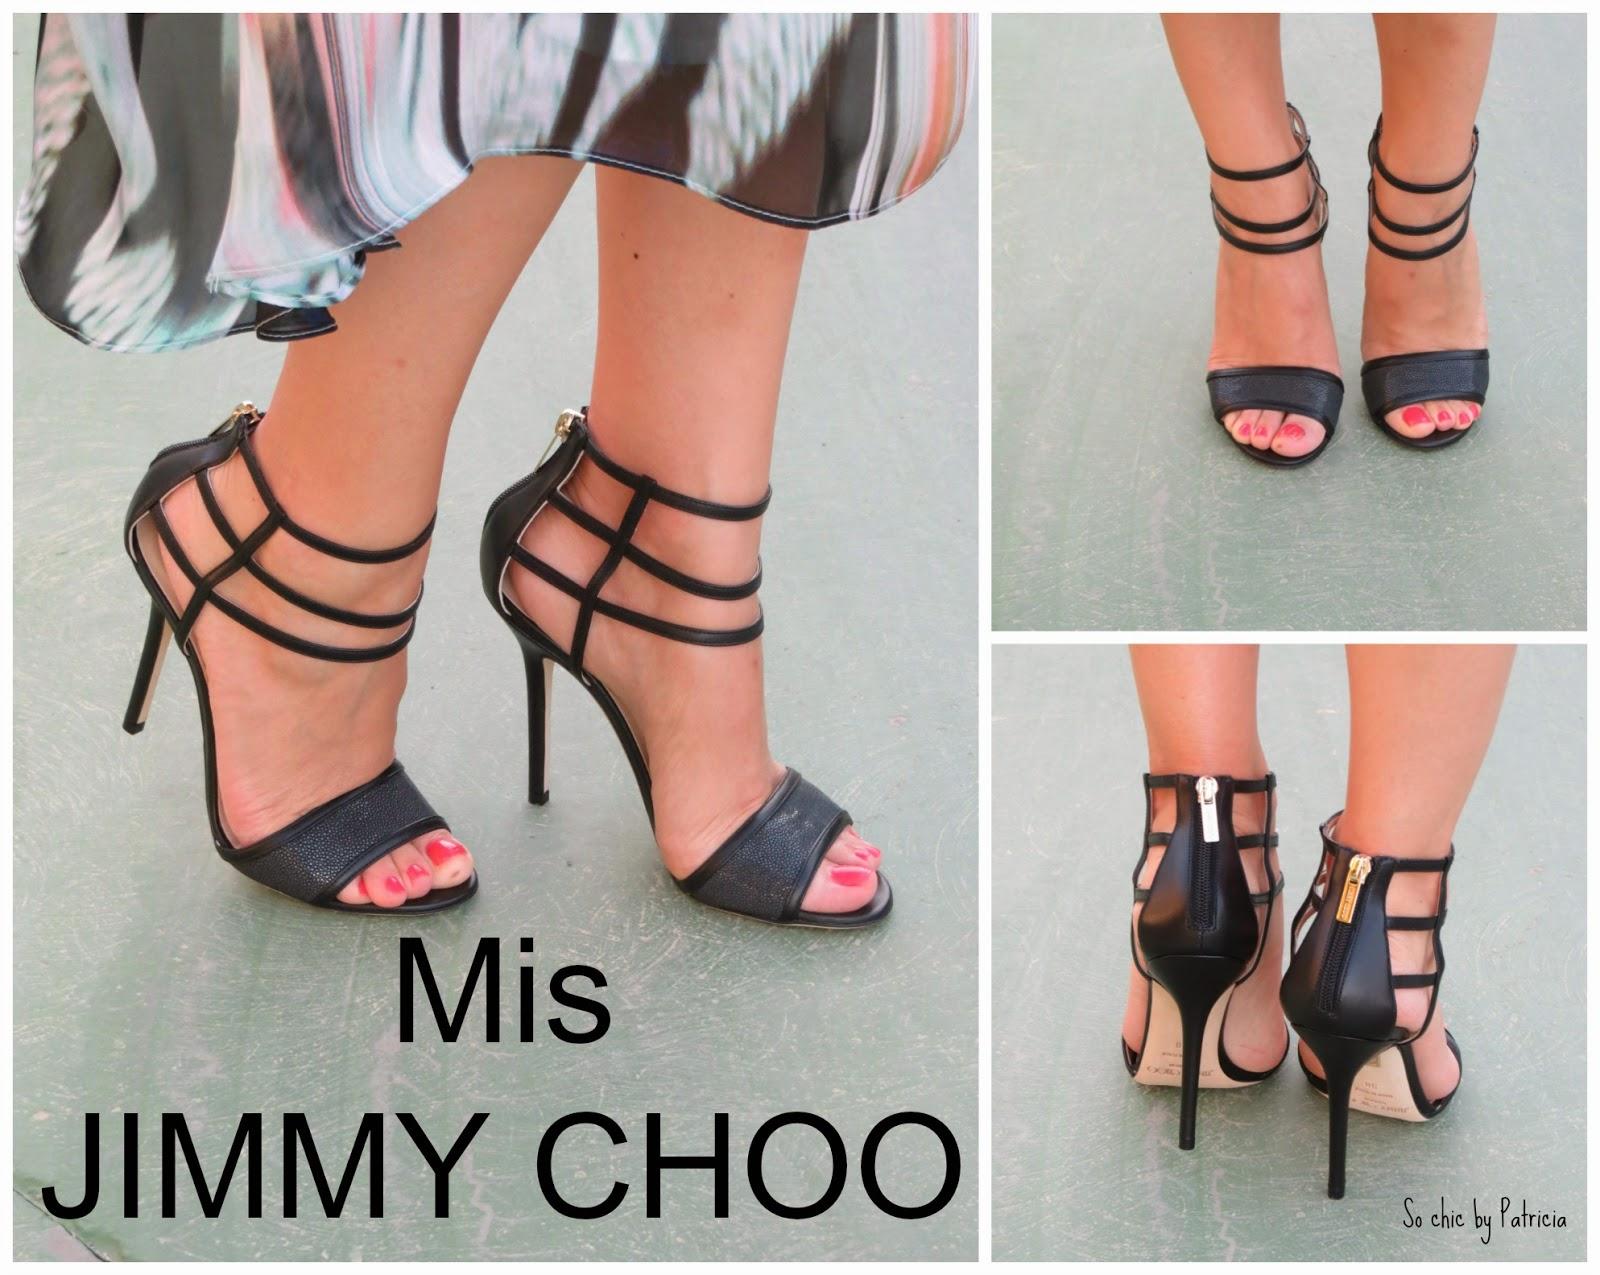 So chic by Patricia_Jimmy Choo